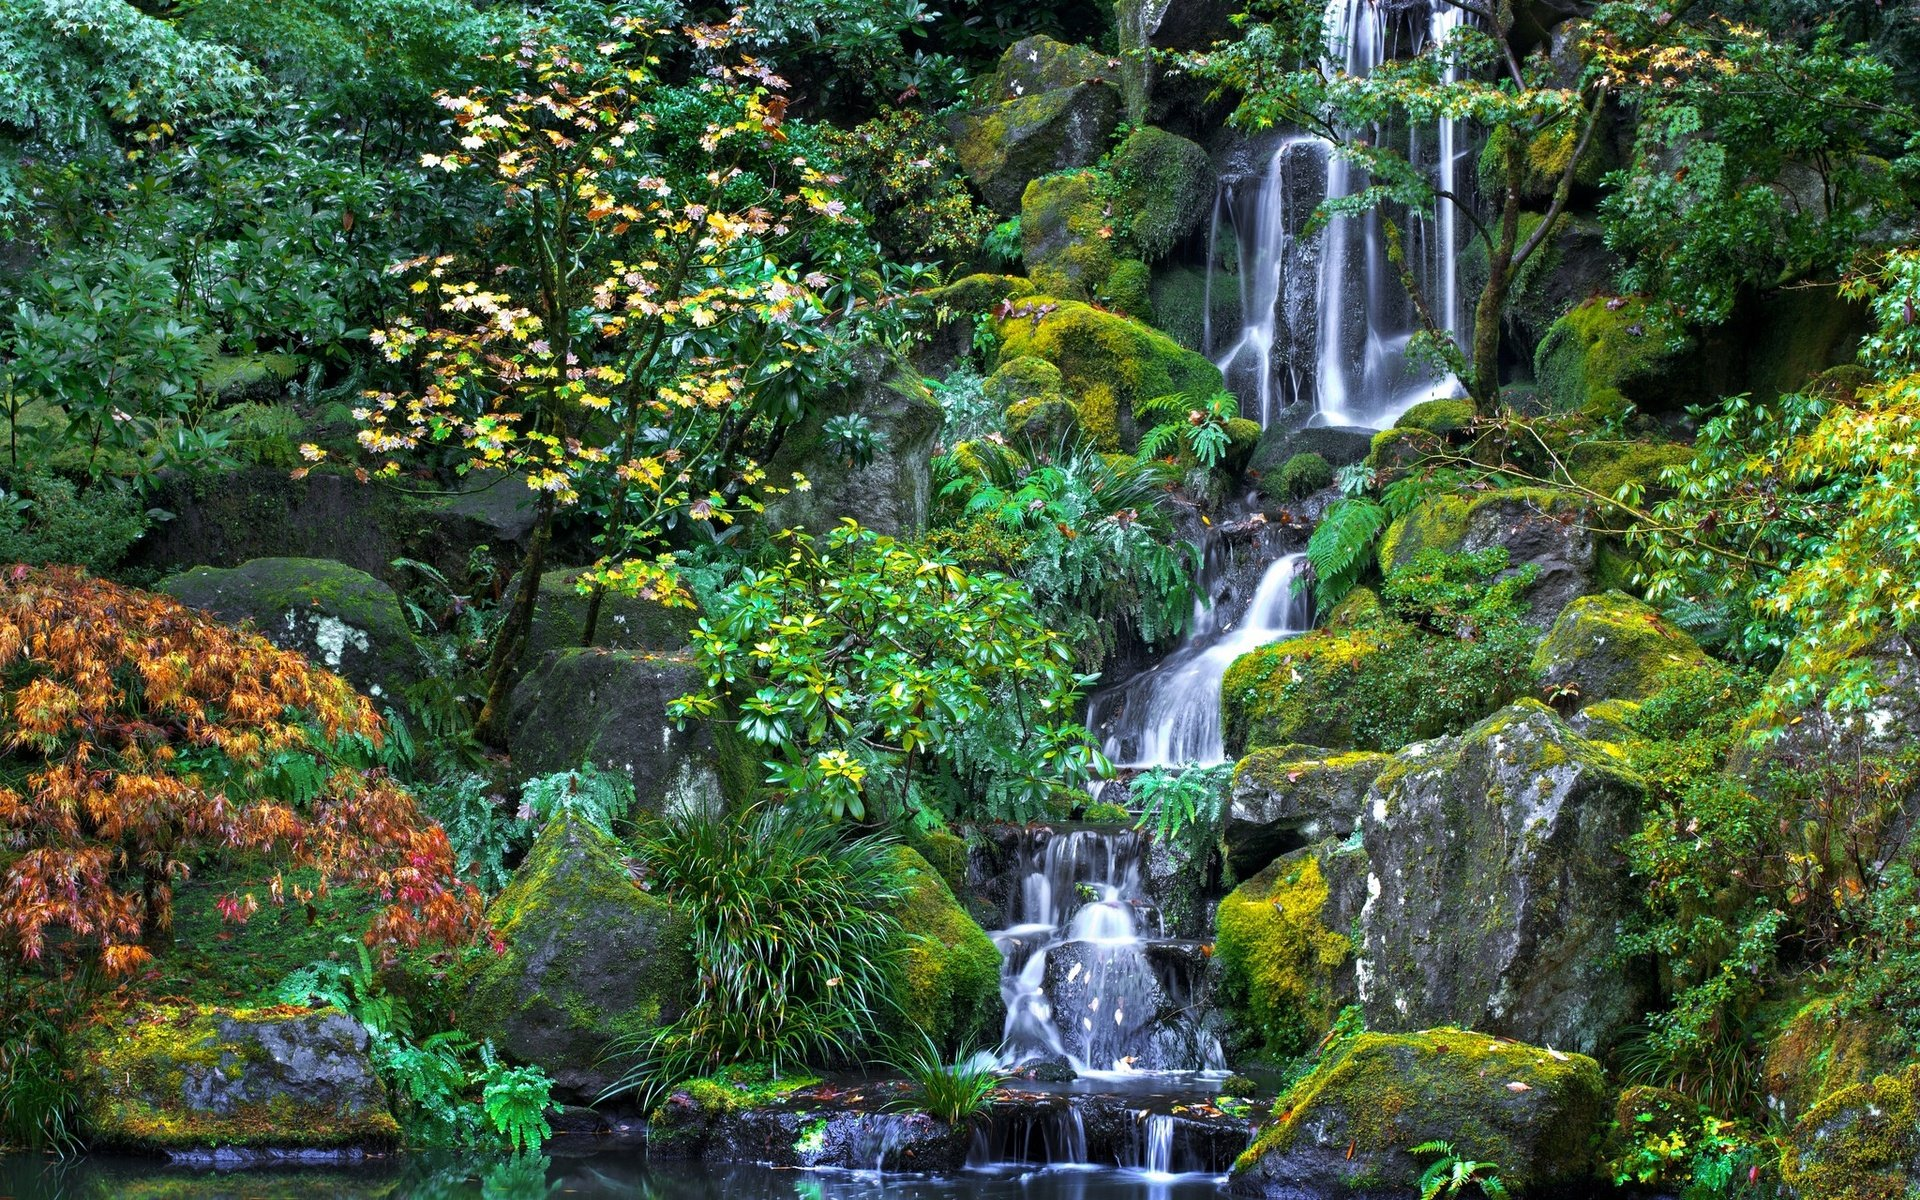 природа раскраска и фото деревья водопады мини-птиц